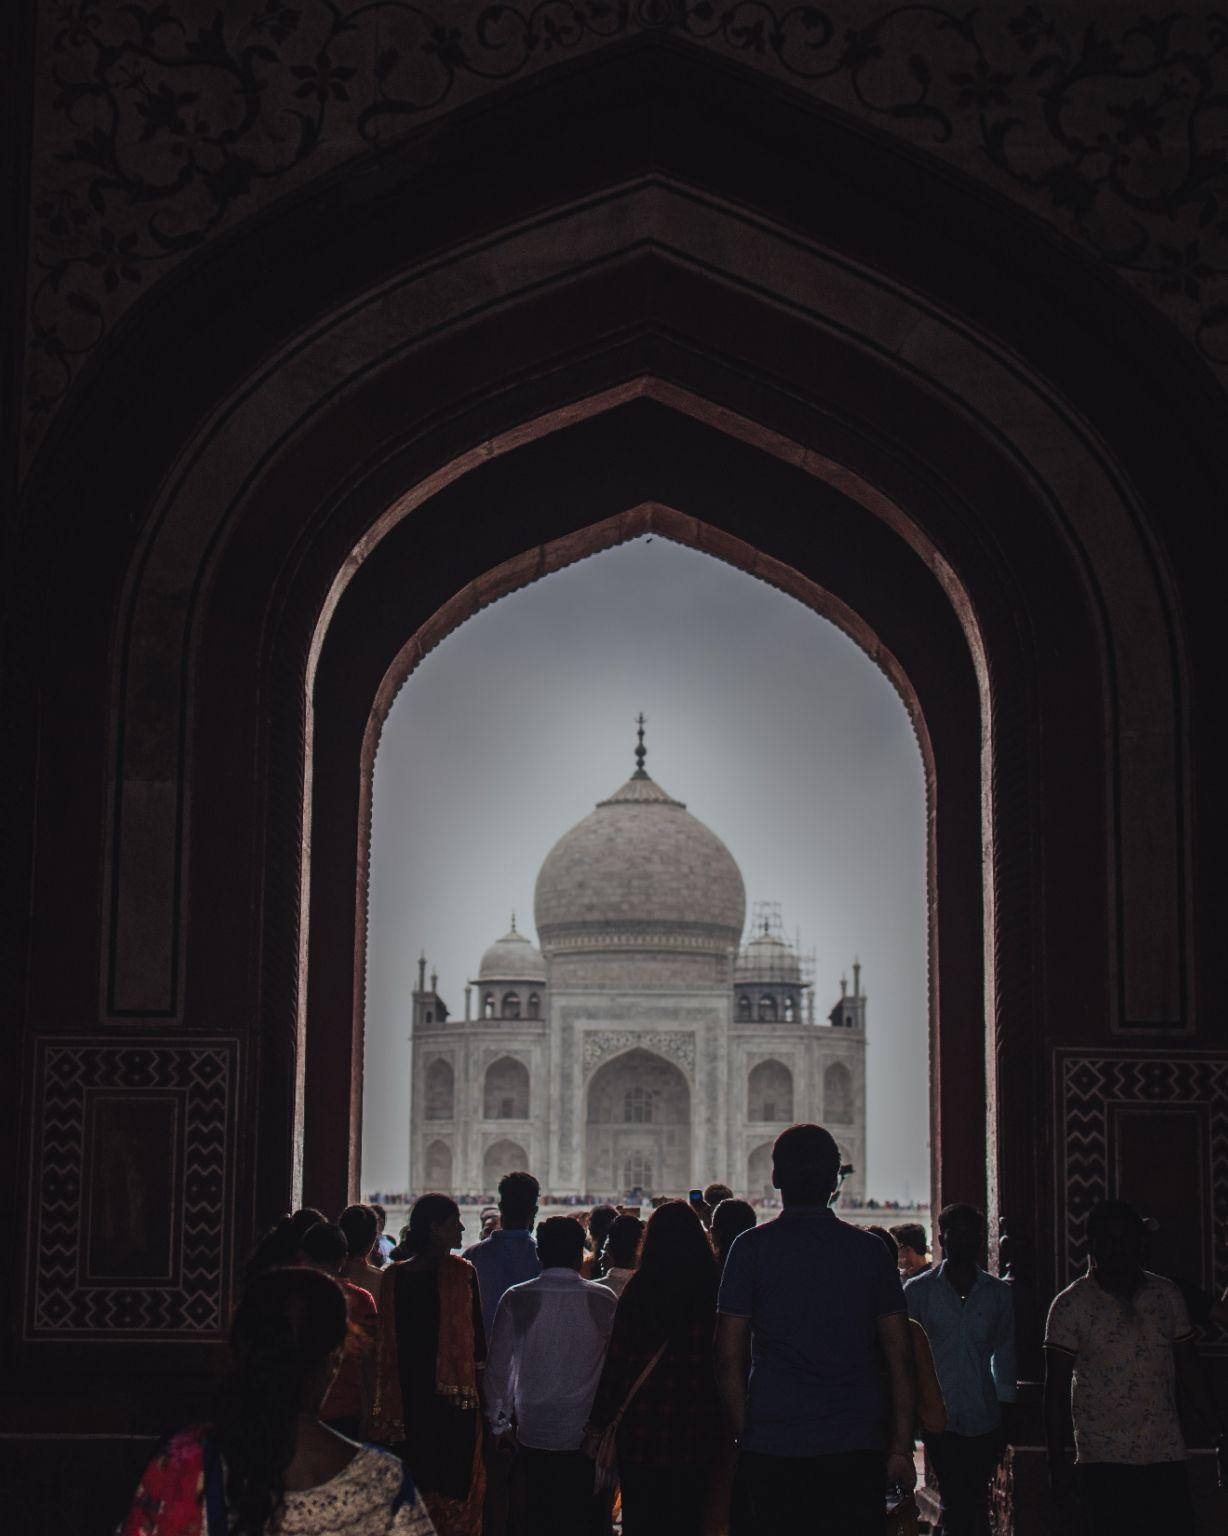 Photo of Agra By Chow Parij